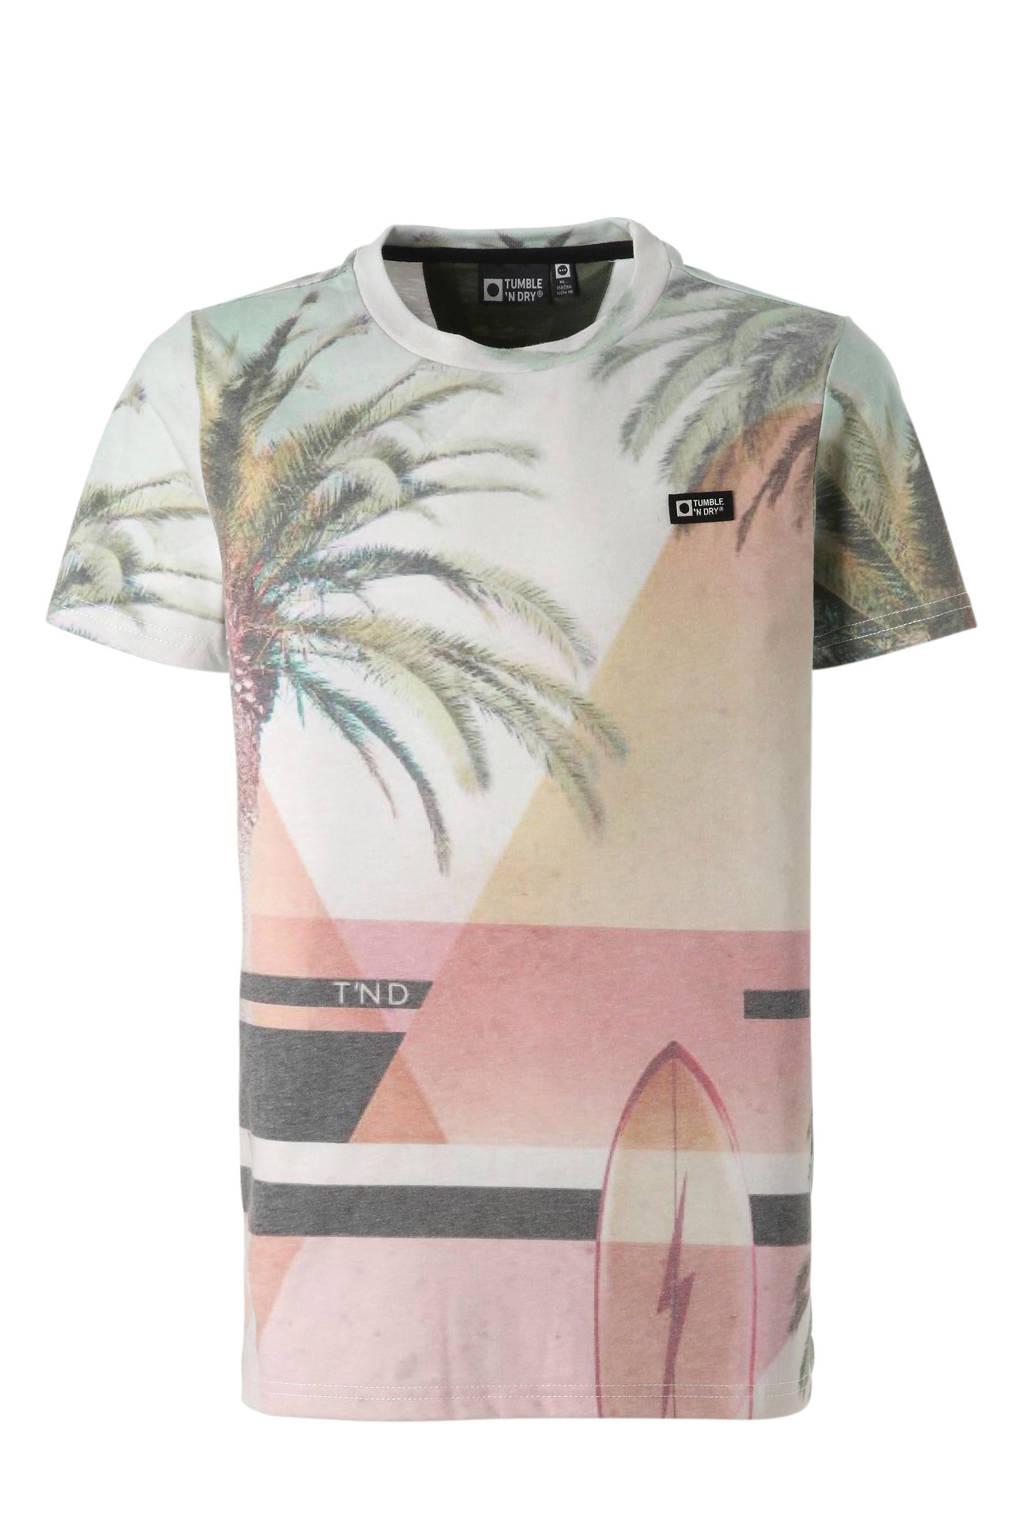 Tumble 'n Dry Hi T-shirt Fino met all over print, Geel/groen/roze